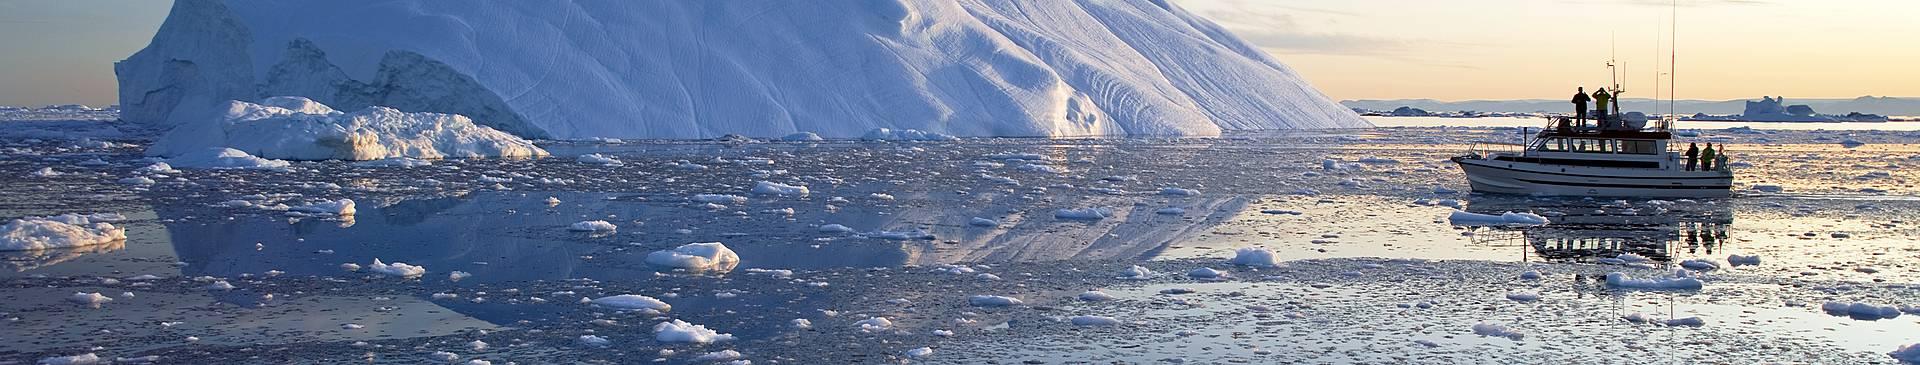 Greenland in February